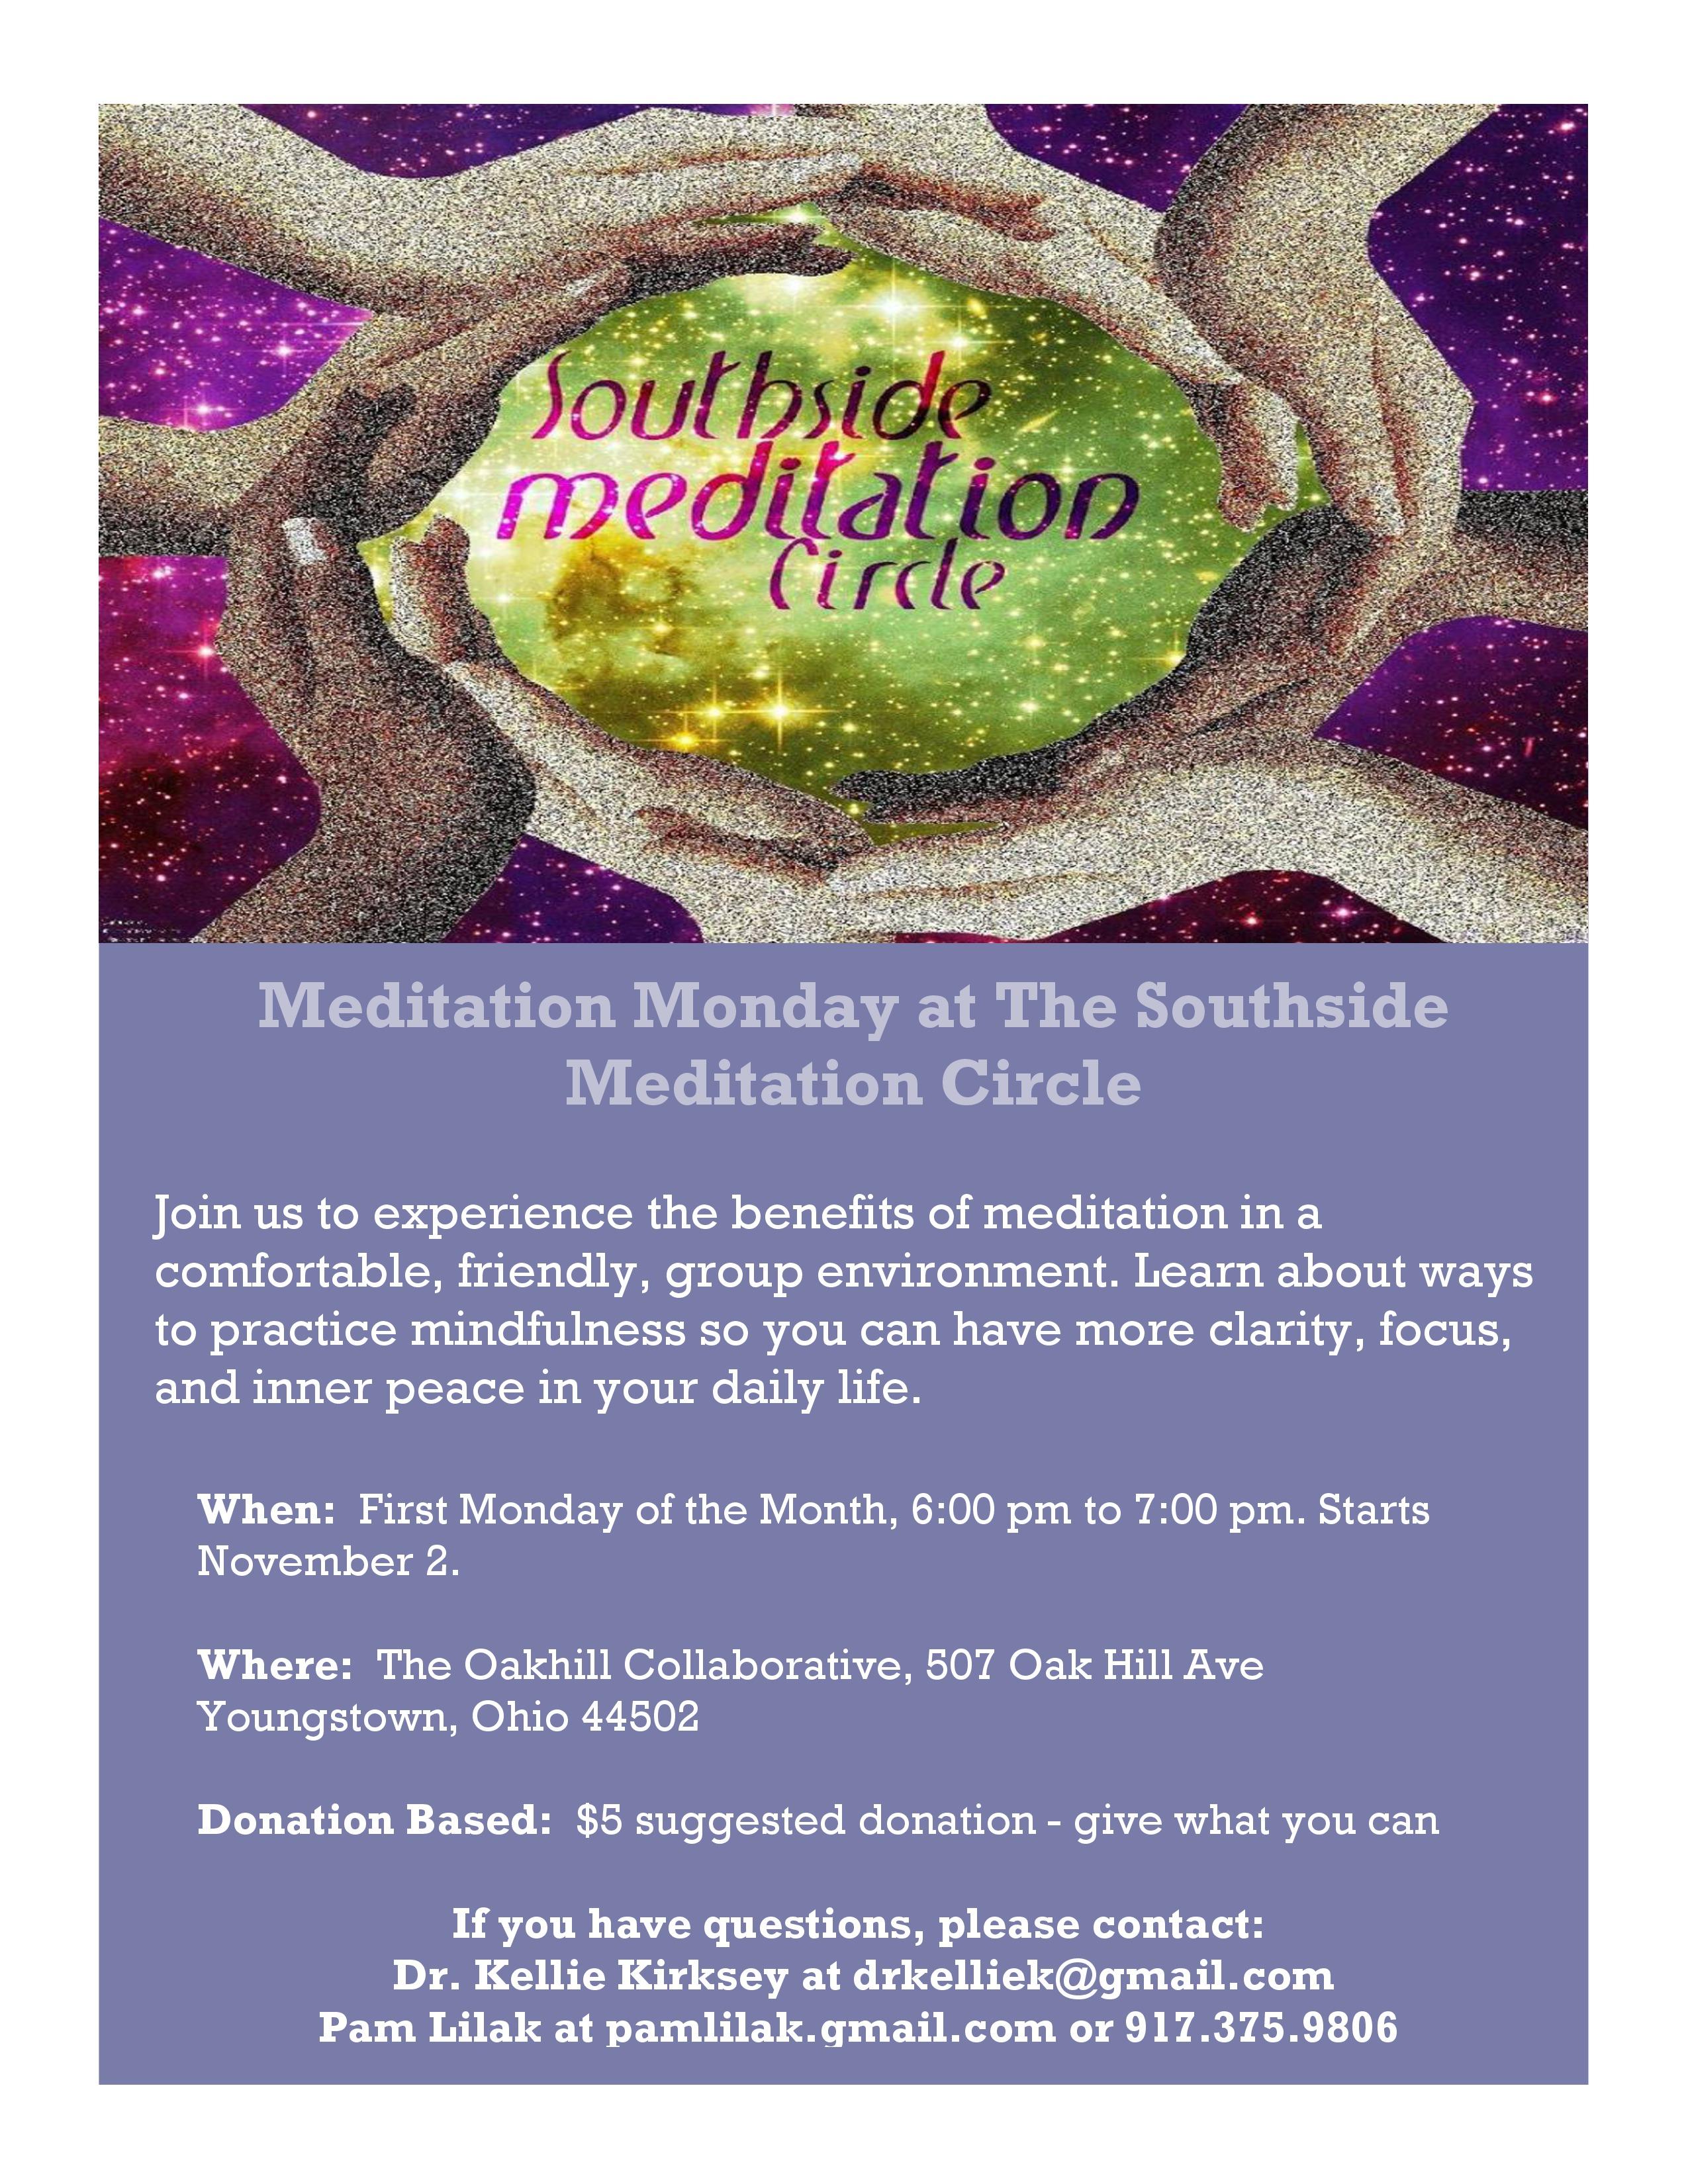 Southside Meditation Circle